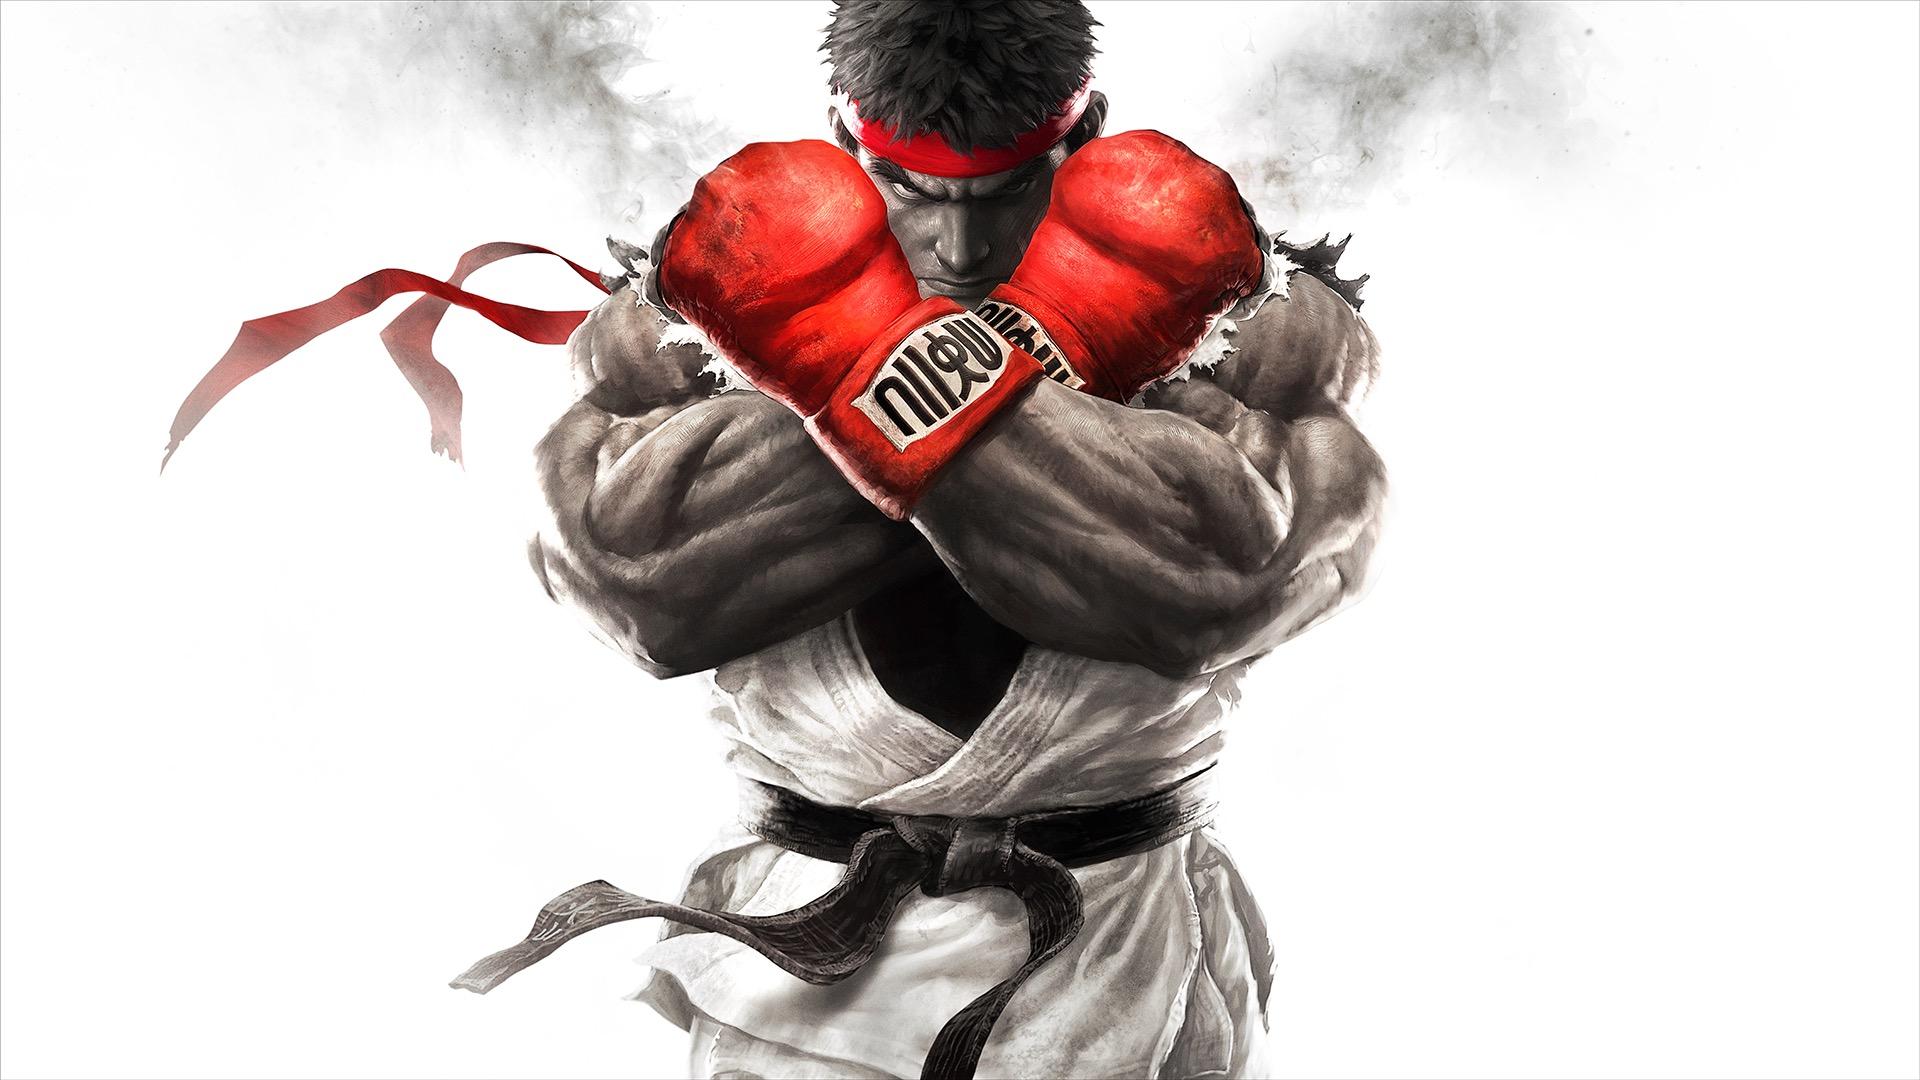 Video Game Street Fighter V 1920x1080